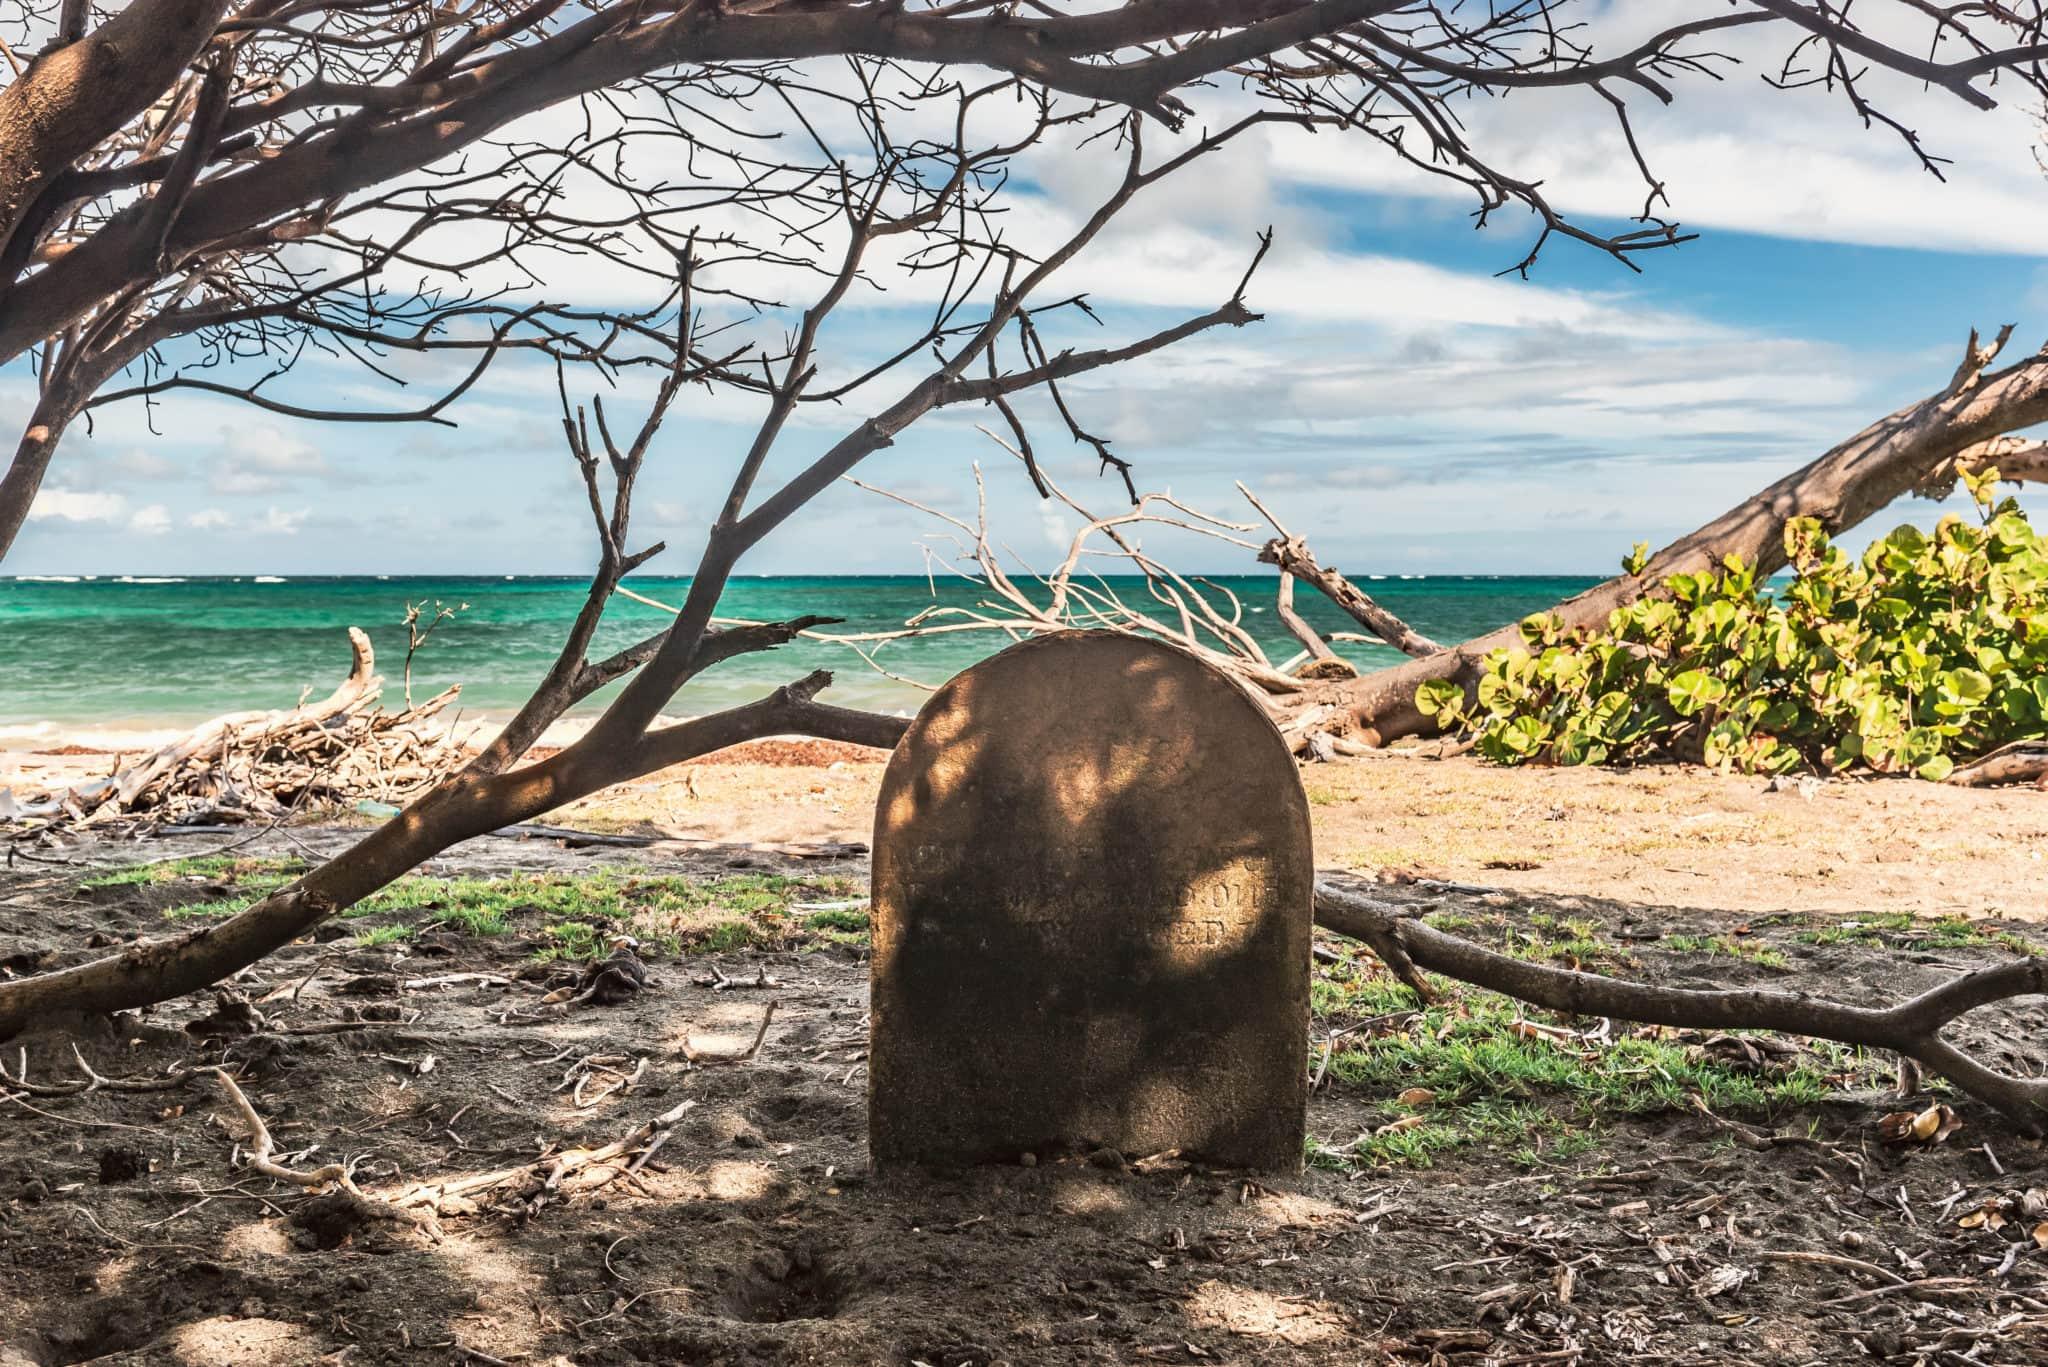 The Spookiest Beach in the Caribbean